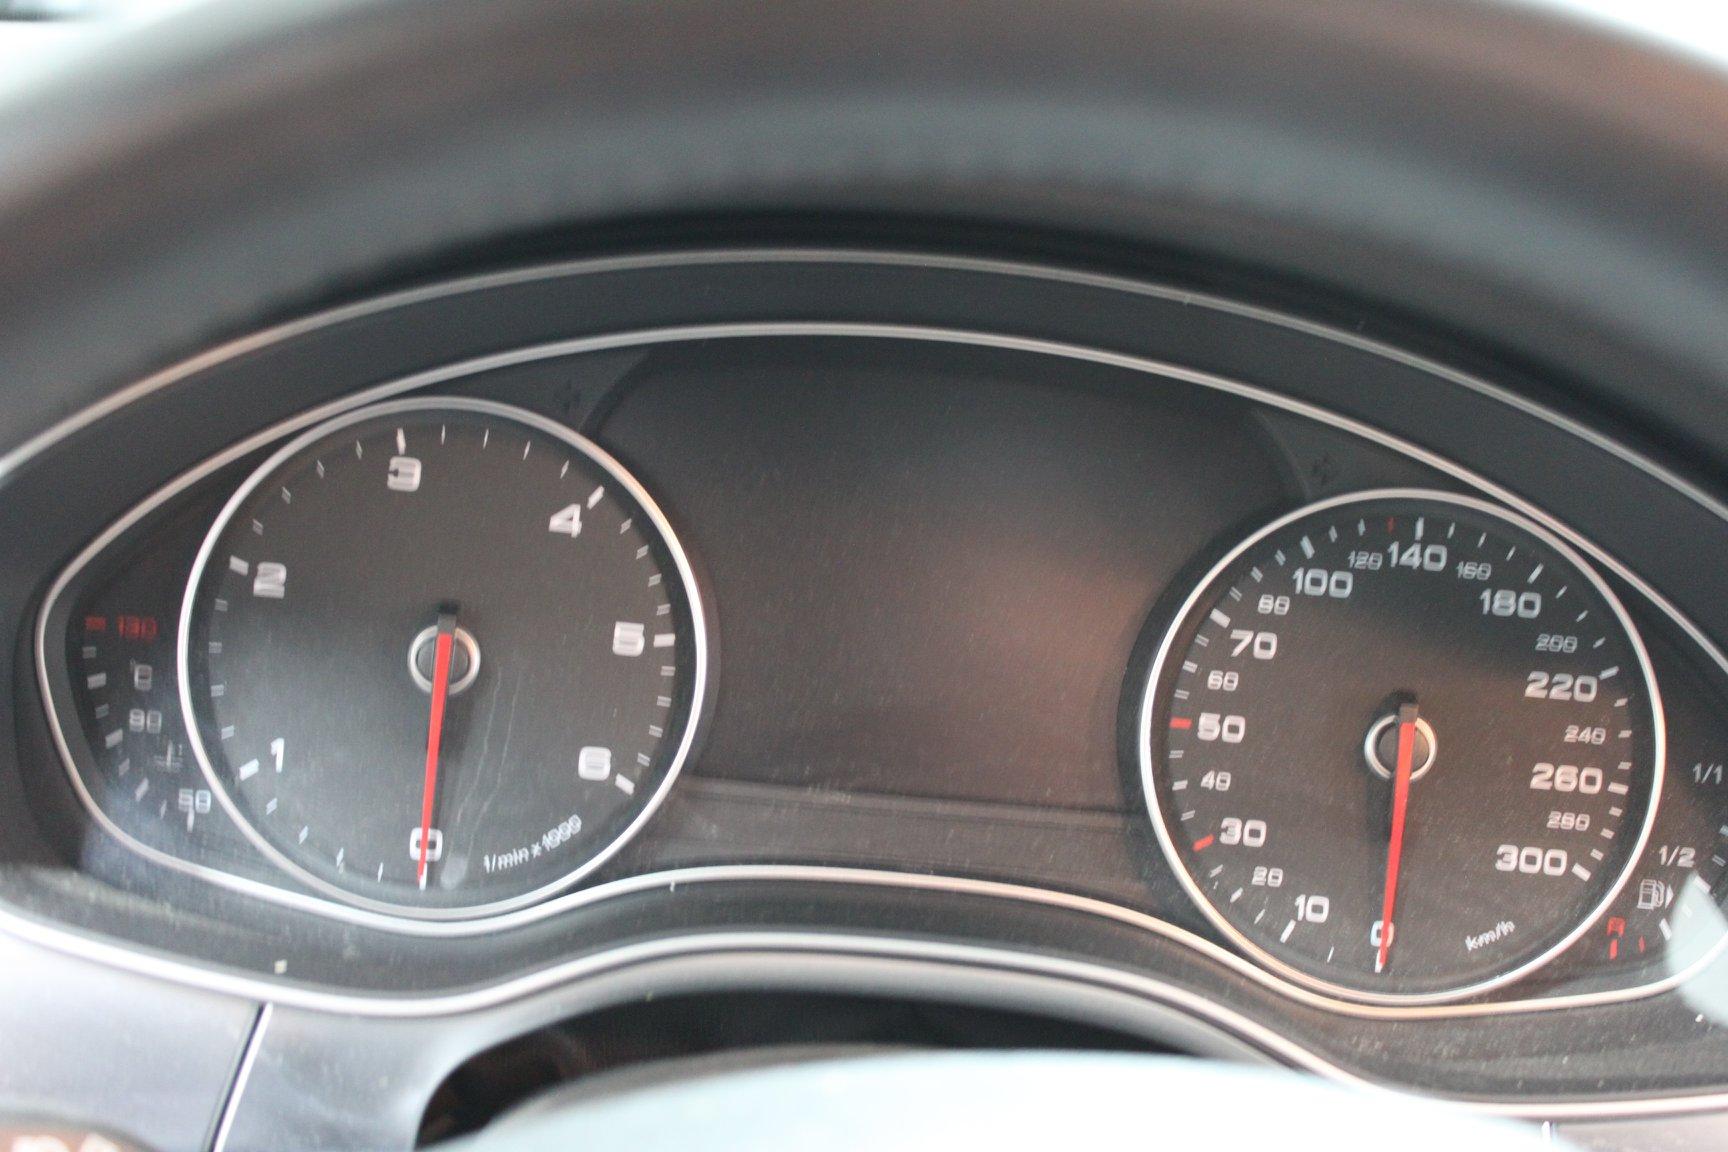 AUDI A6 C7 3.0 TDI V6 2013 QUATTRO